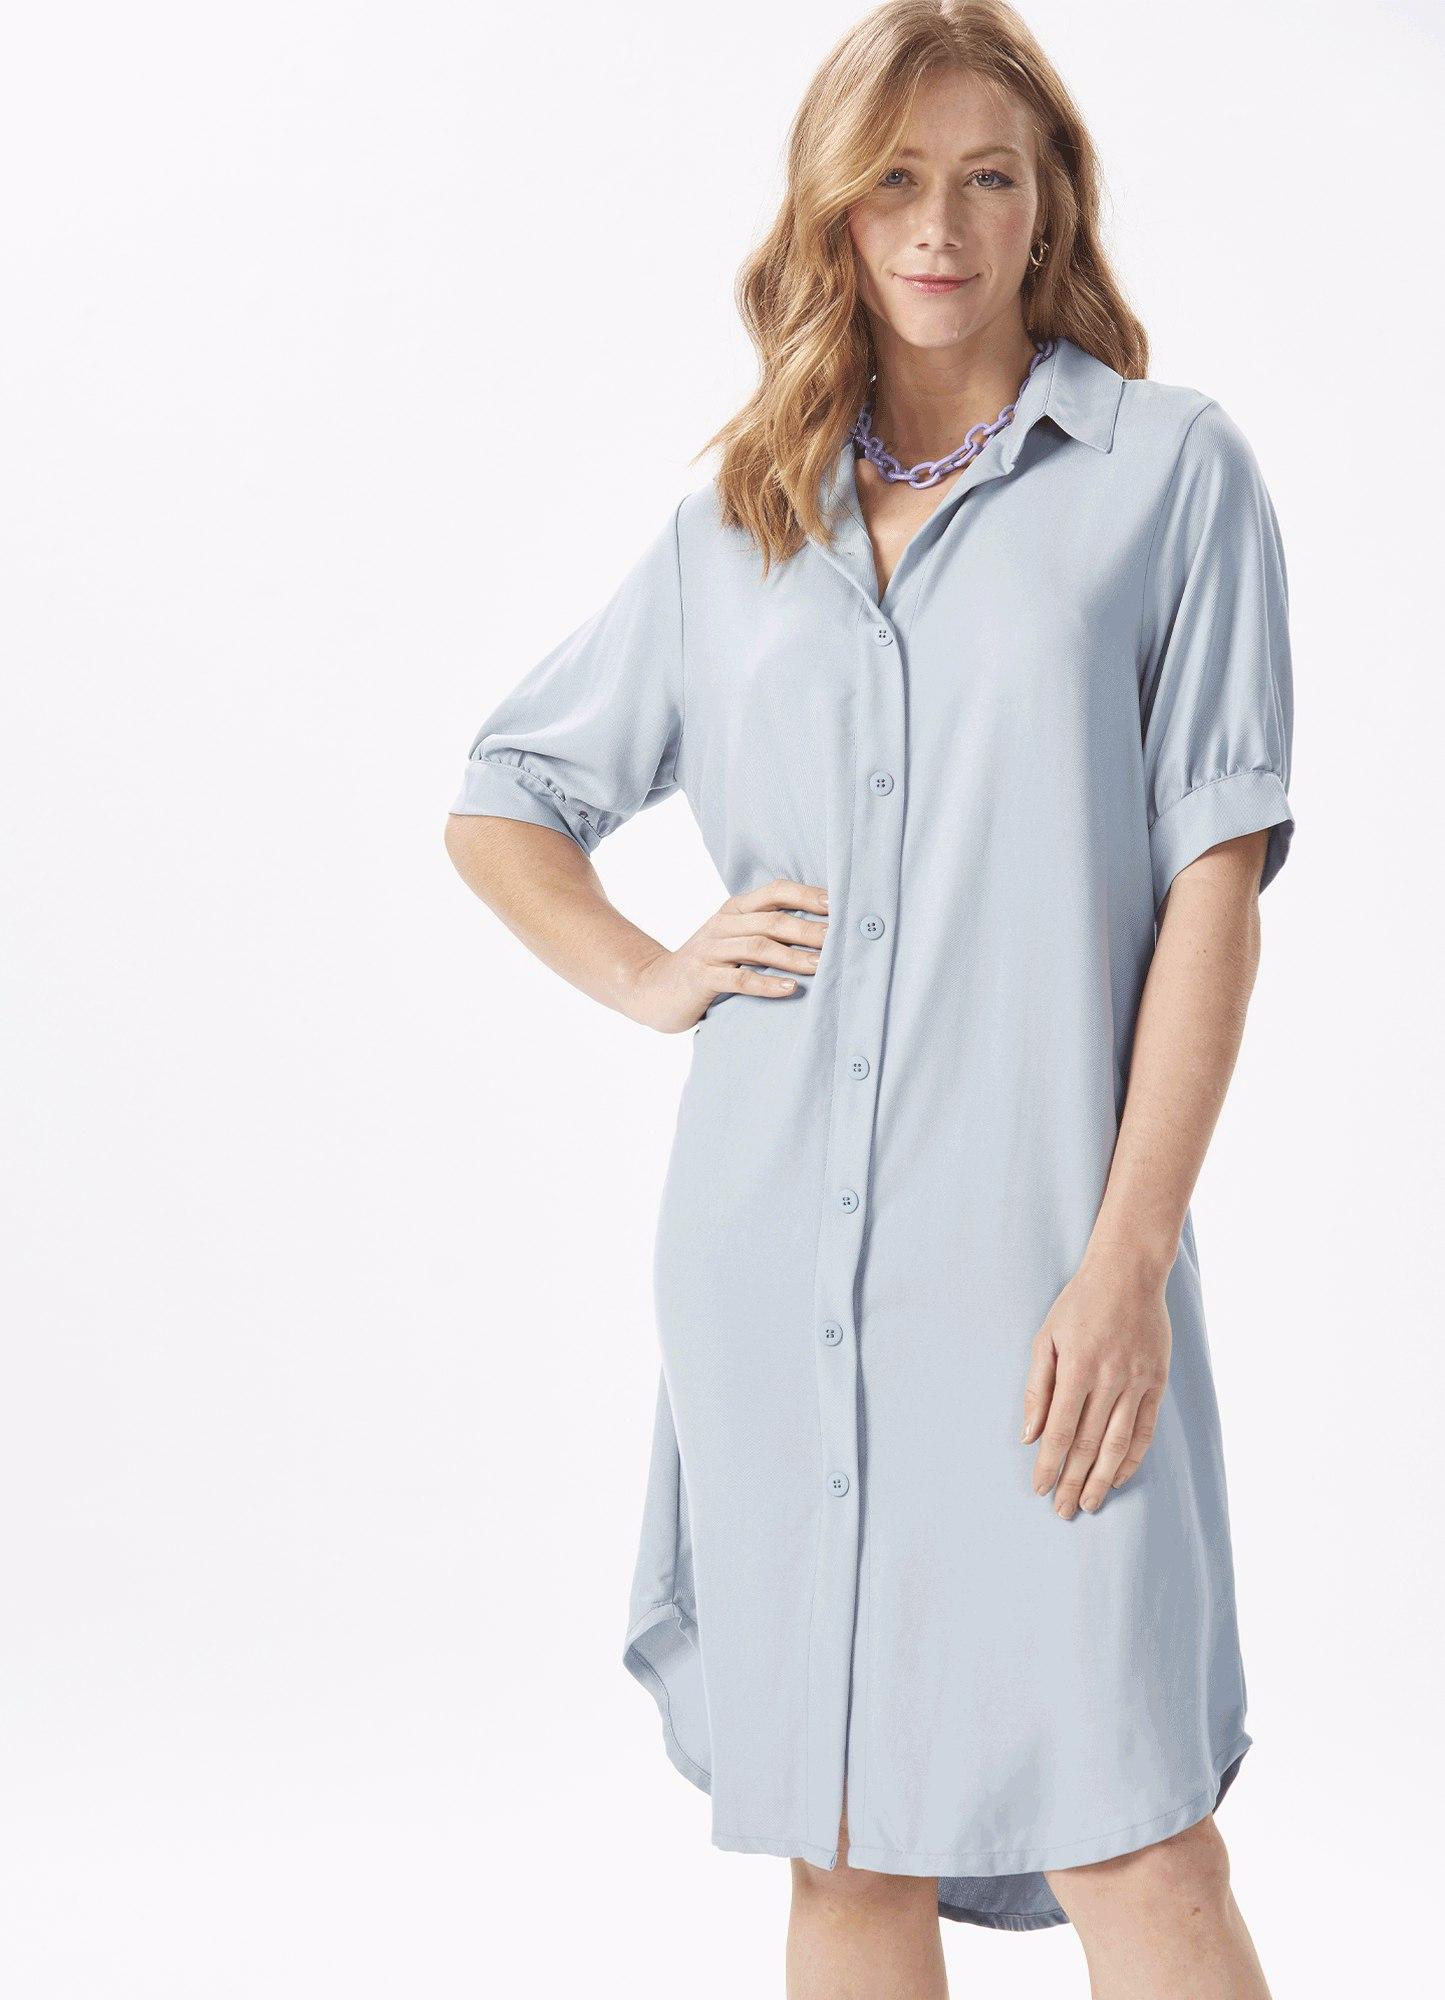 Vestido Feminino Tecido Chemise Azul Manga Curta